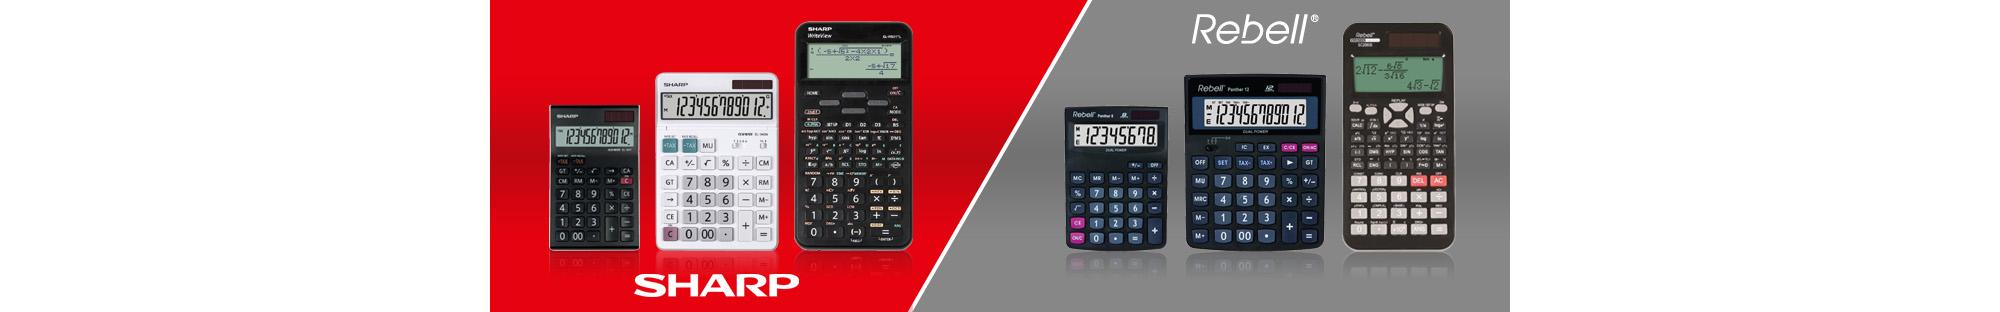 Kalkulačky SHARP a REBELL